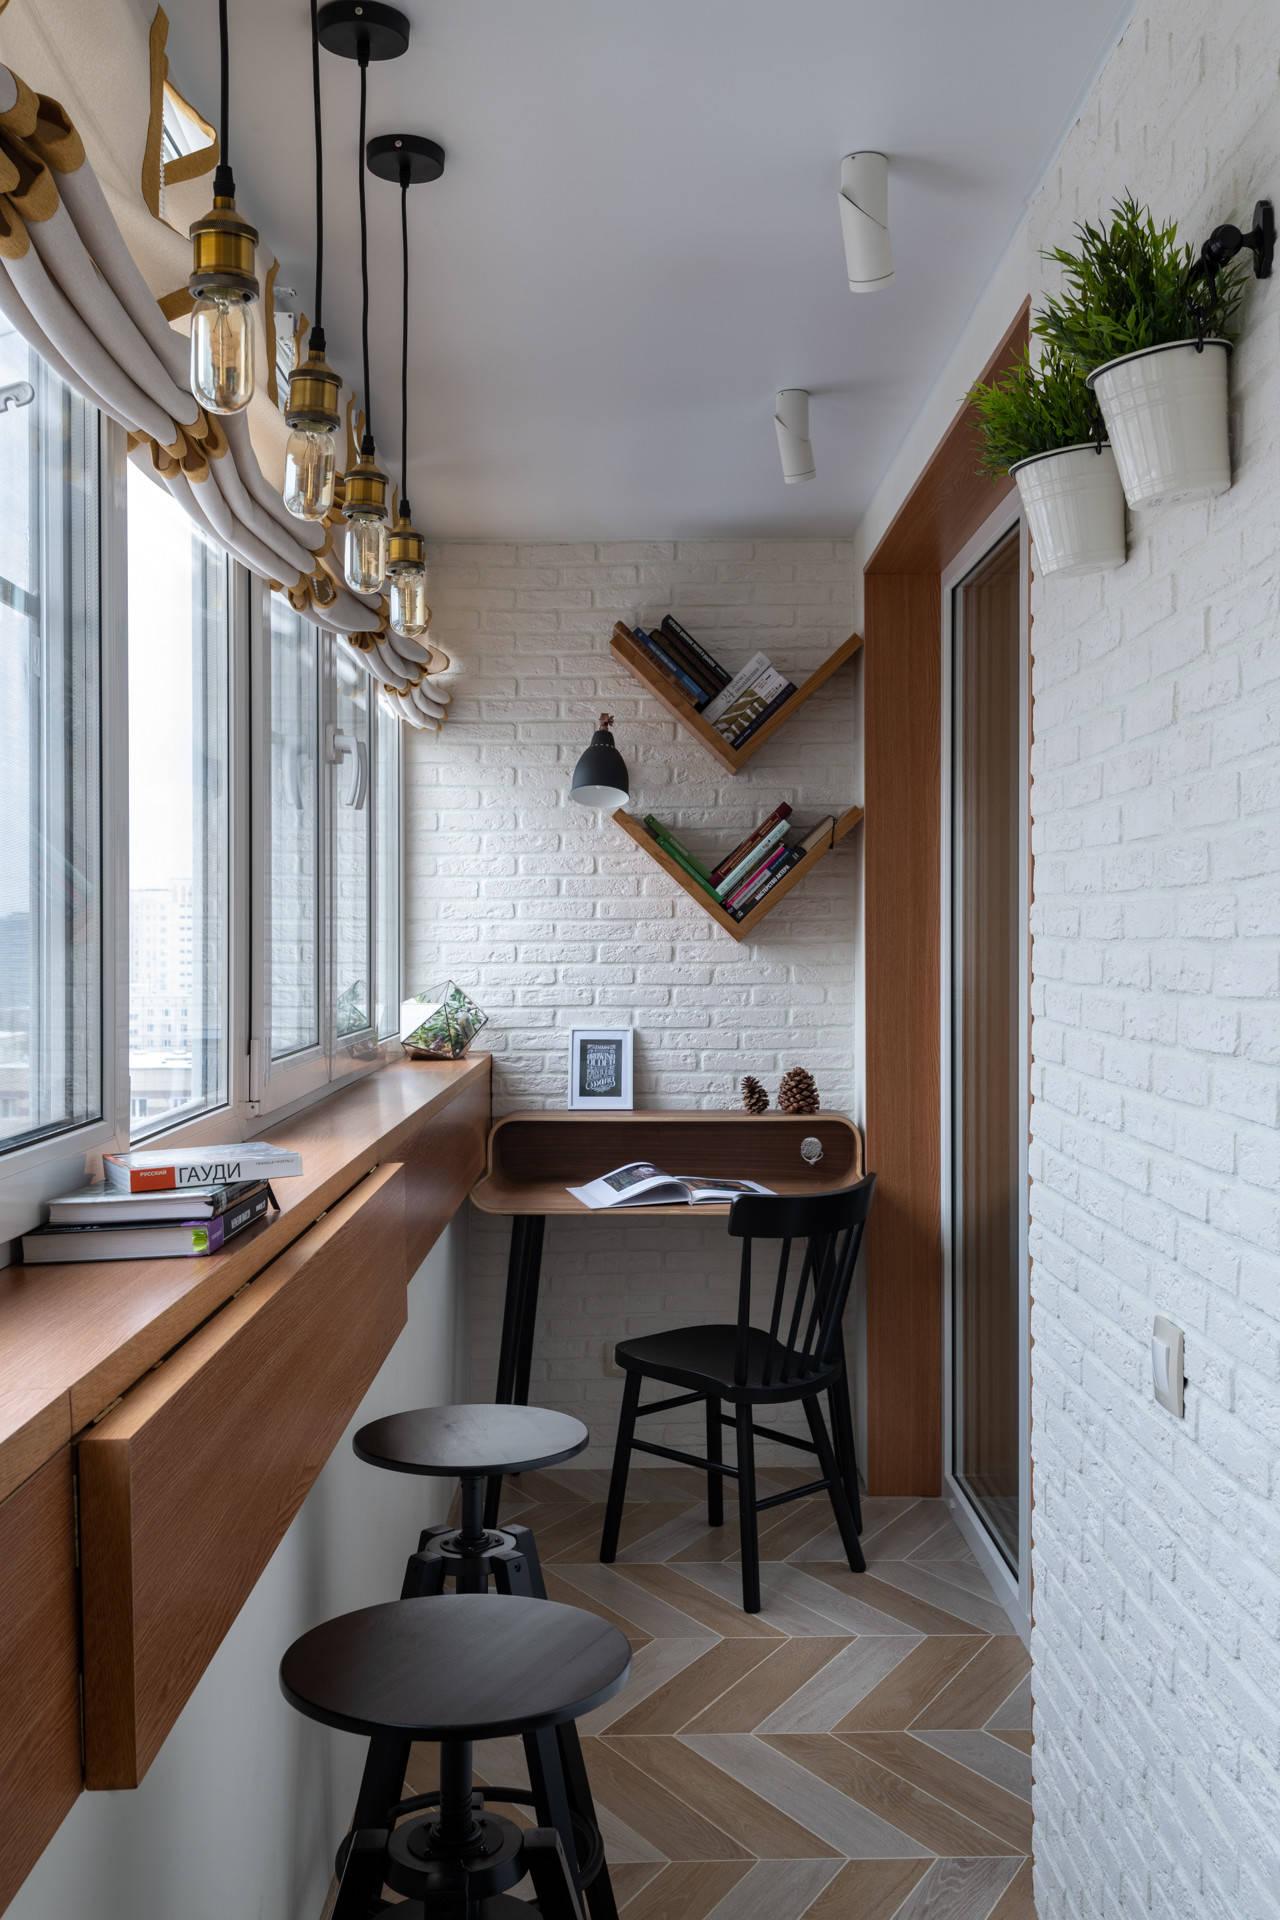 75 Beautiful Small Balcony Pictures Ideas January 2021 Houzz